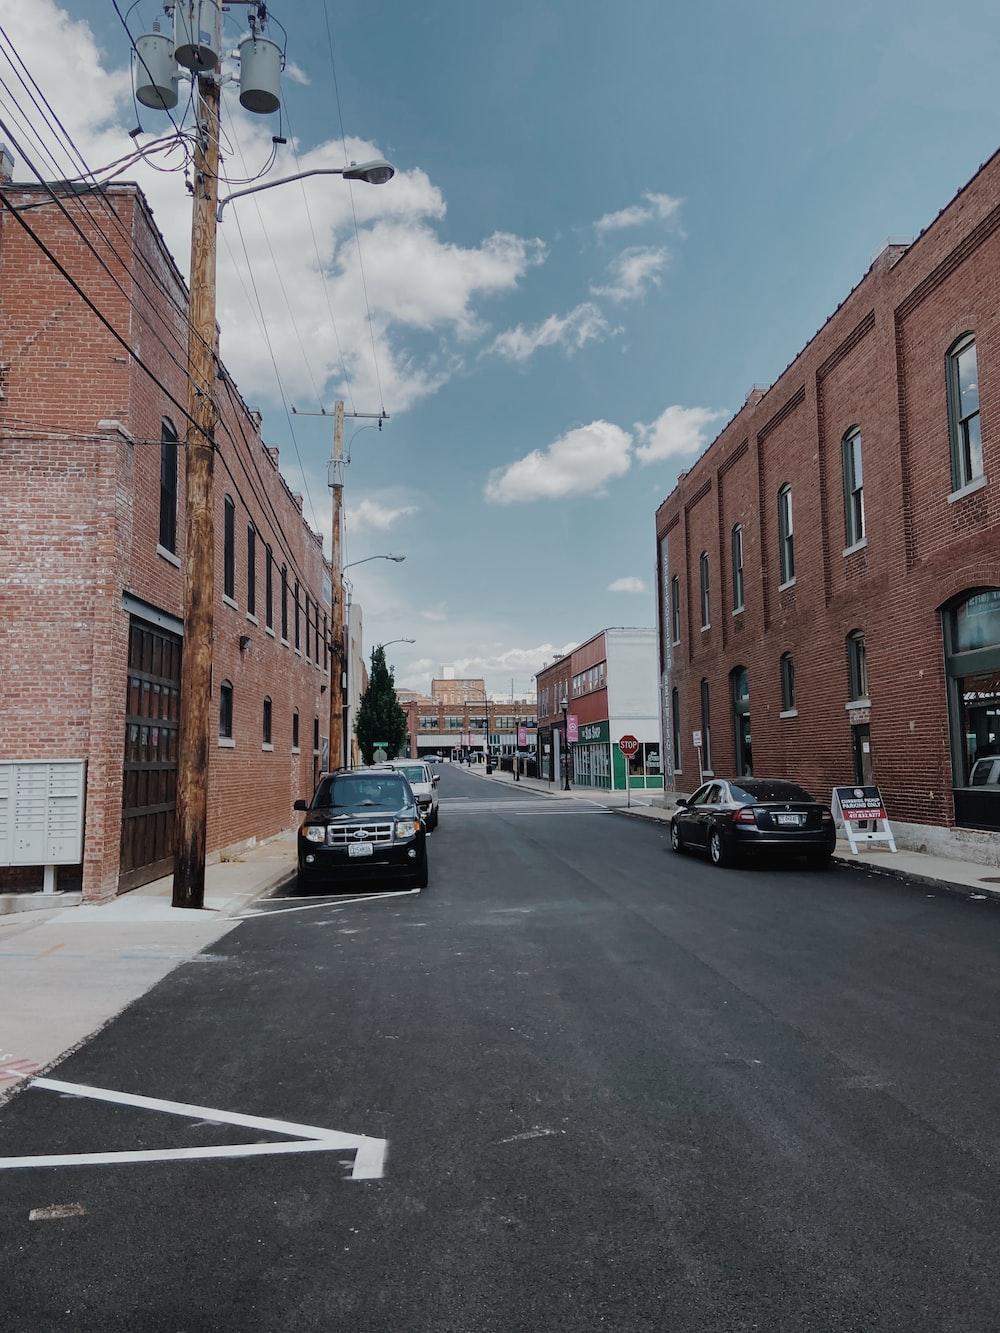 black car parked beside brown concrete building during daytime